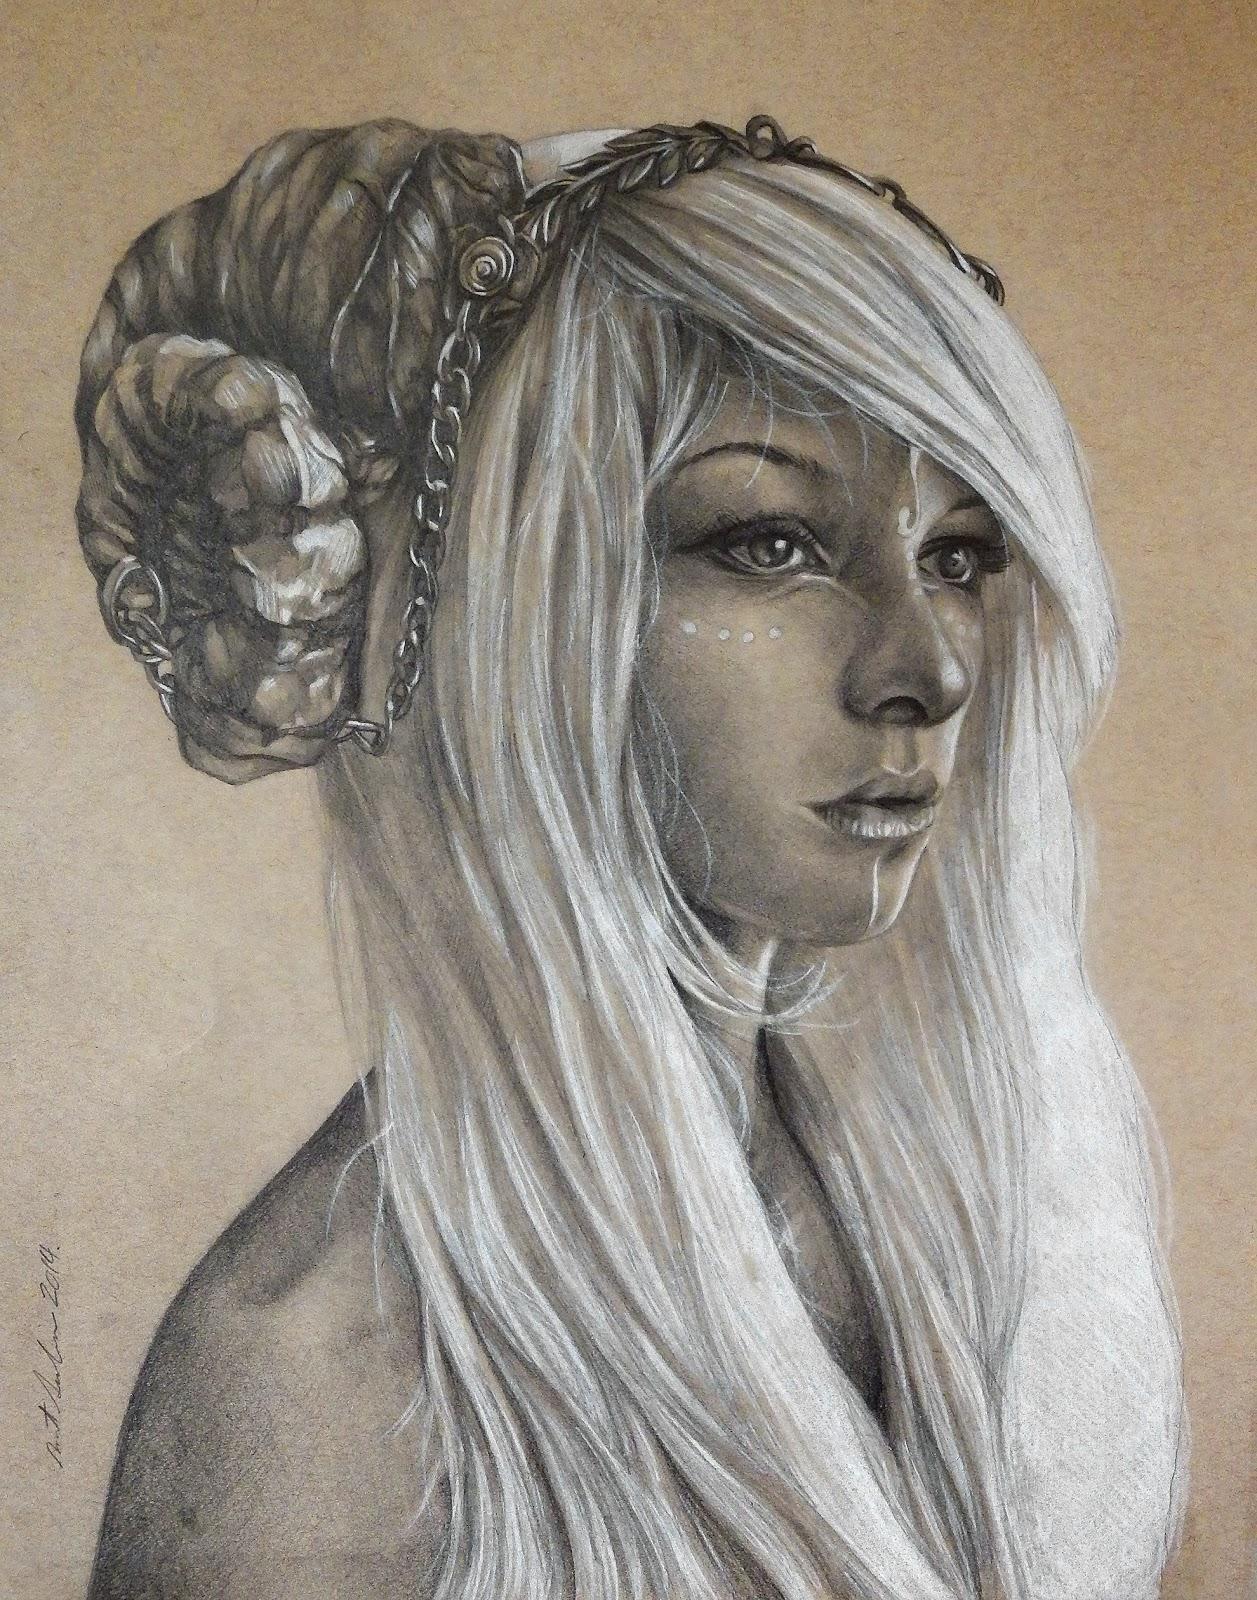 Drawn portrait traditional Drawn Social themed (woman female